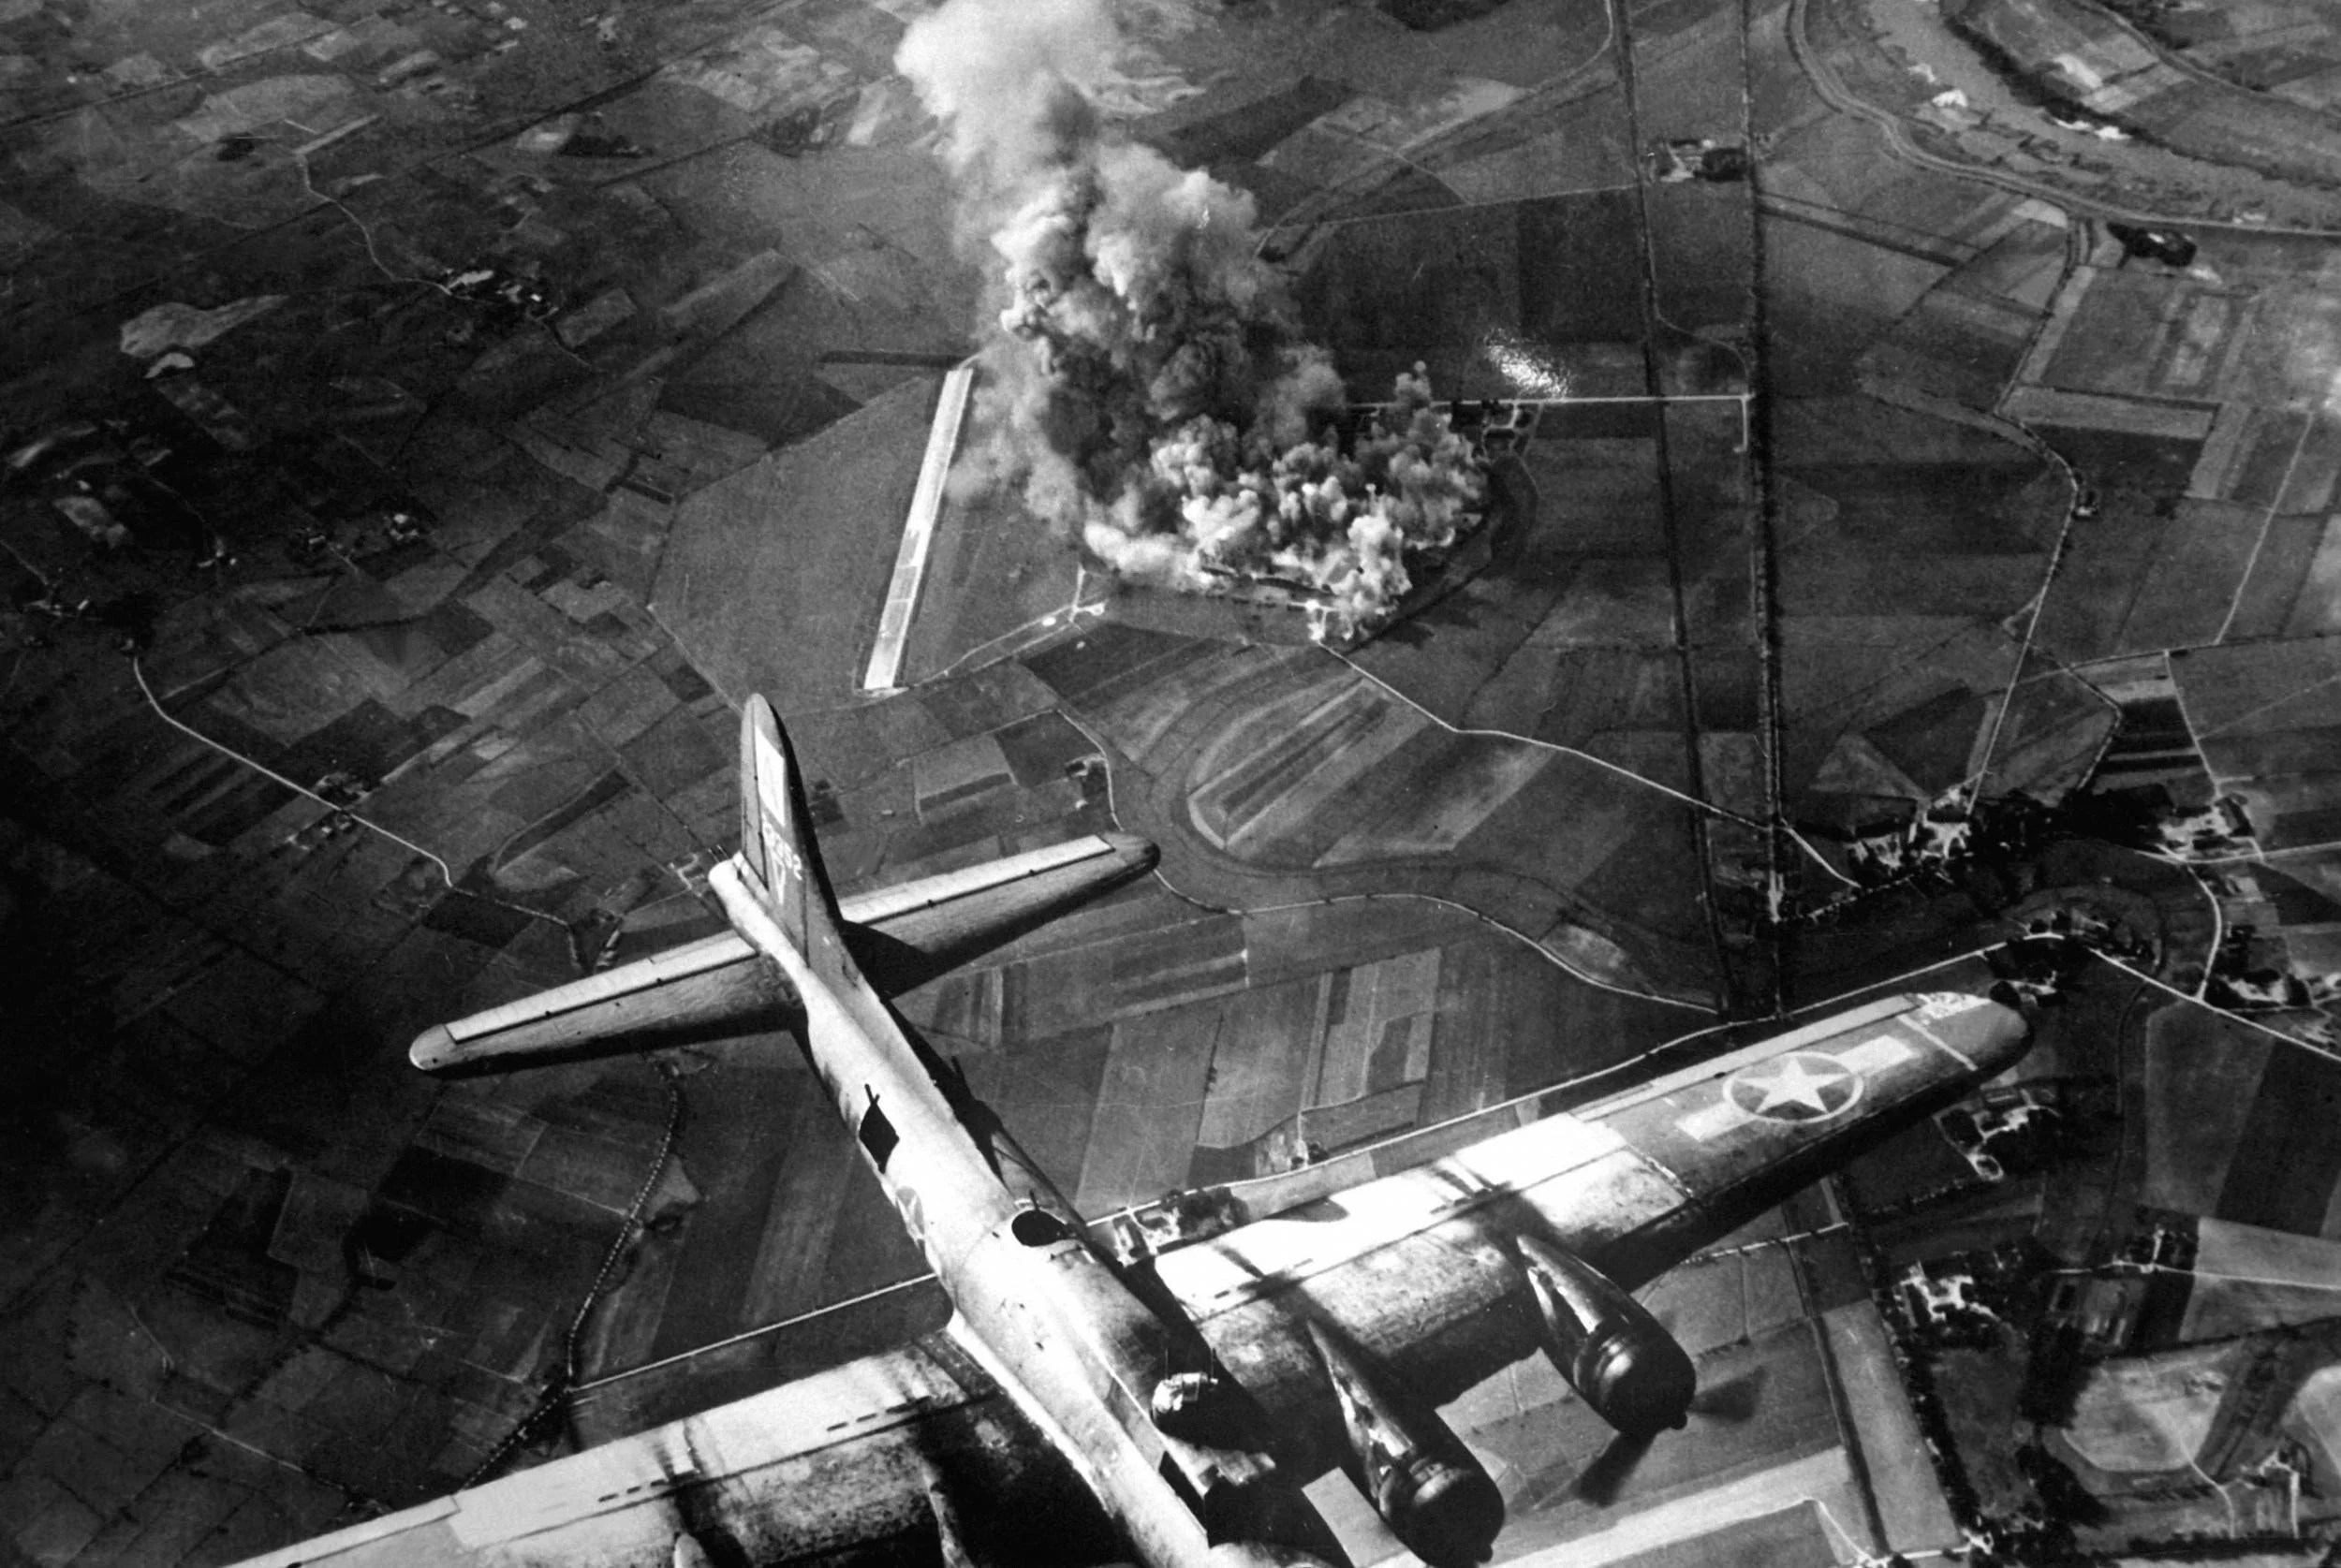 Second World Waring Raids Sent Shockwaves To Edge Of